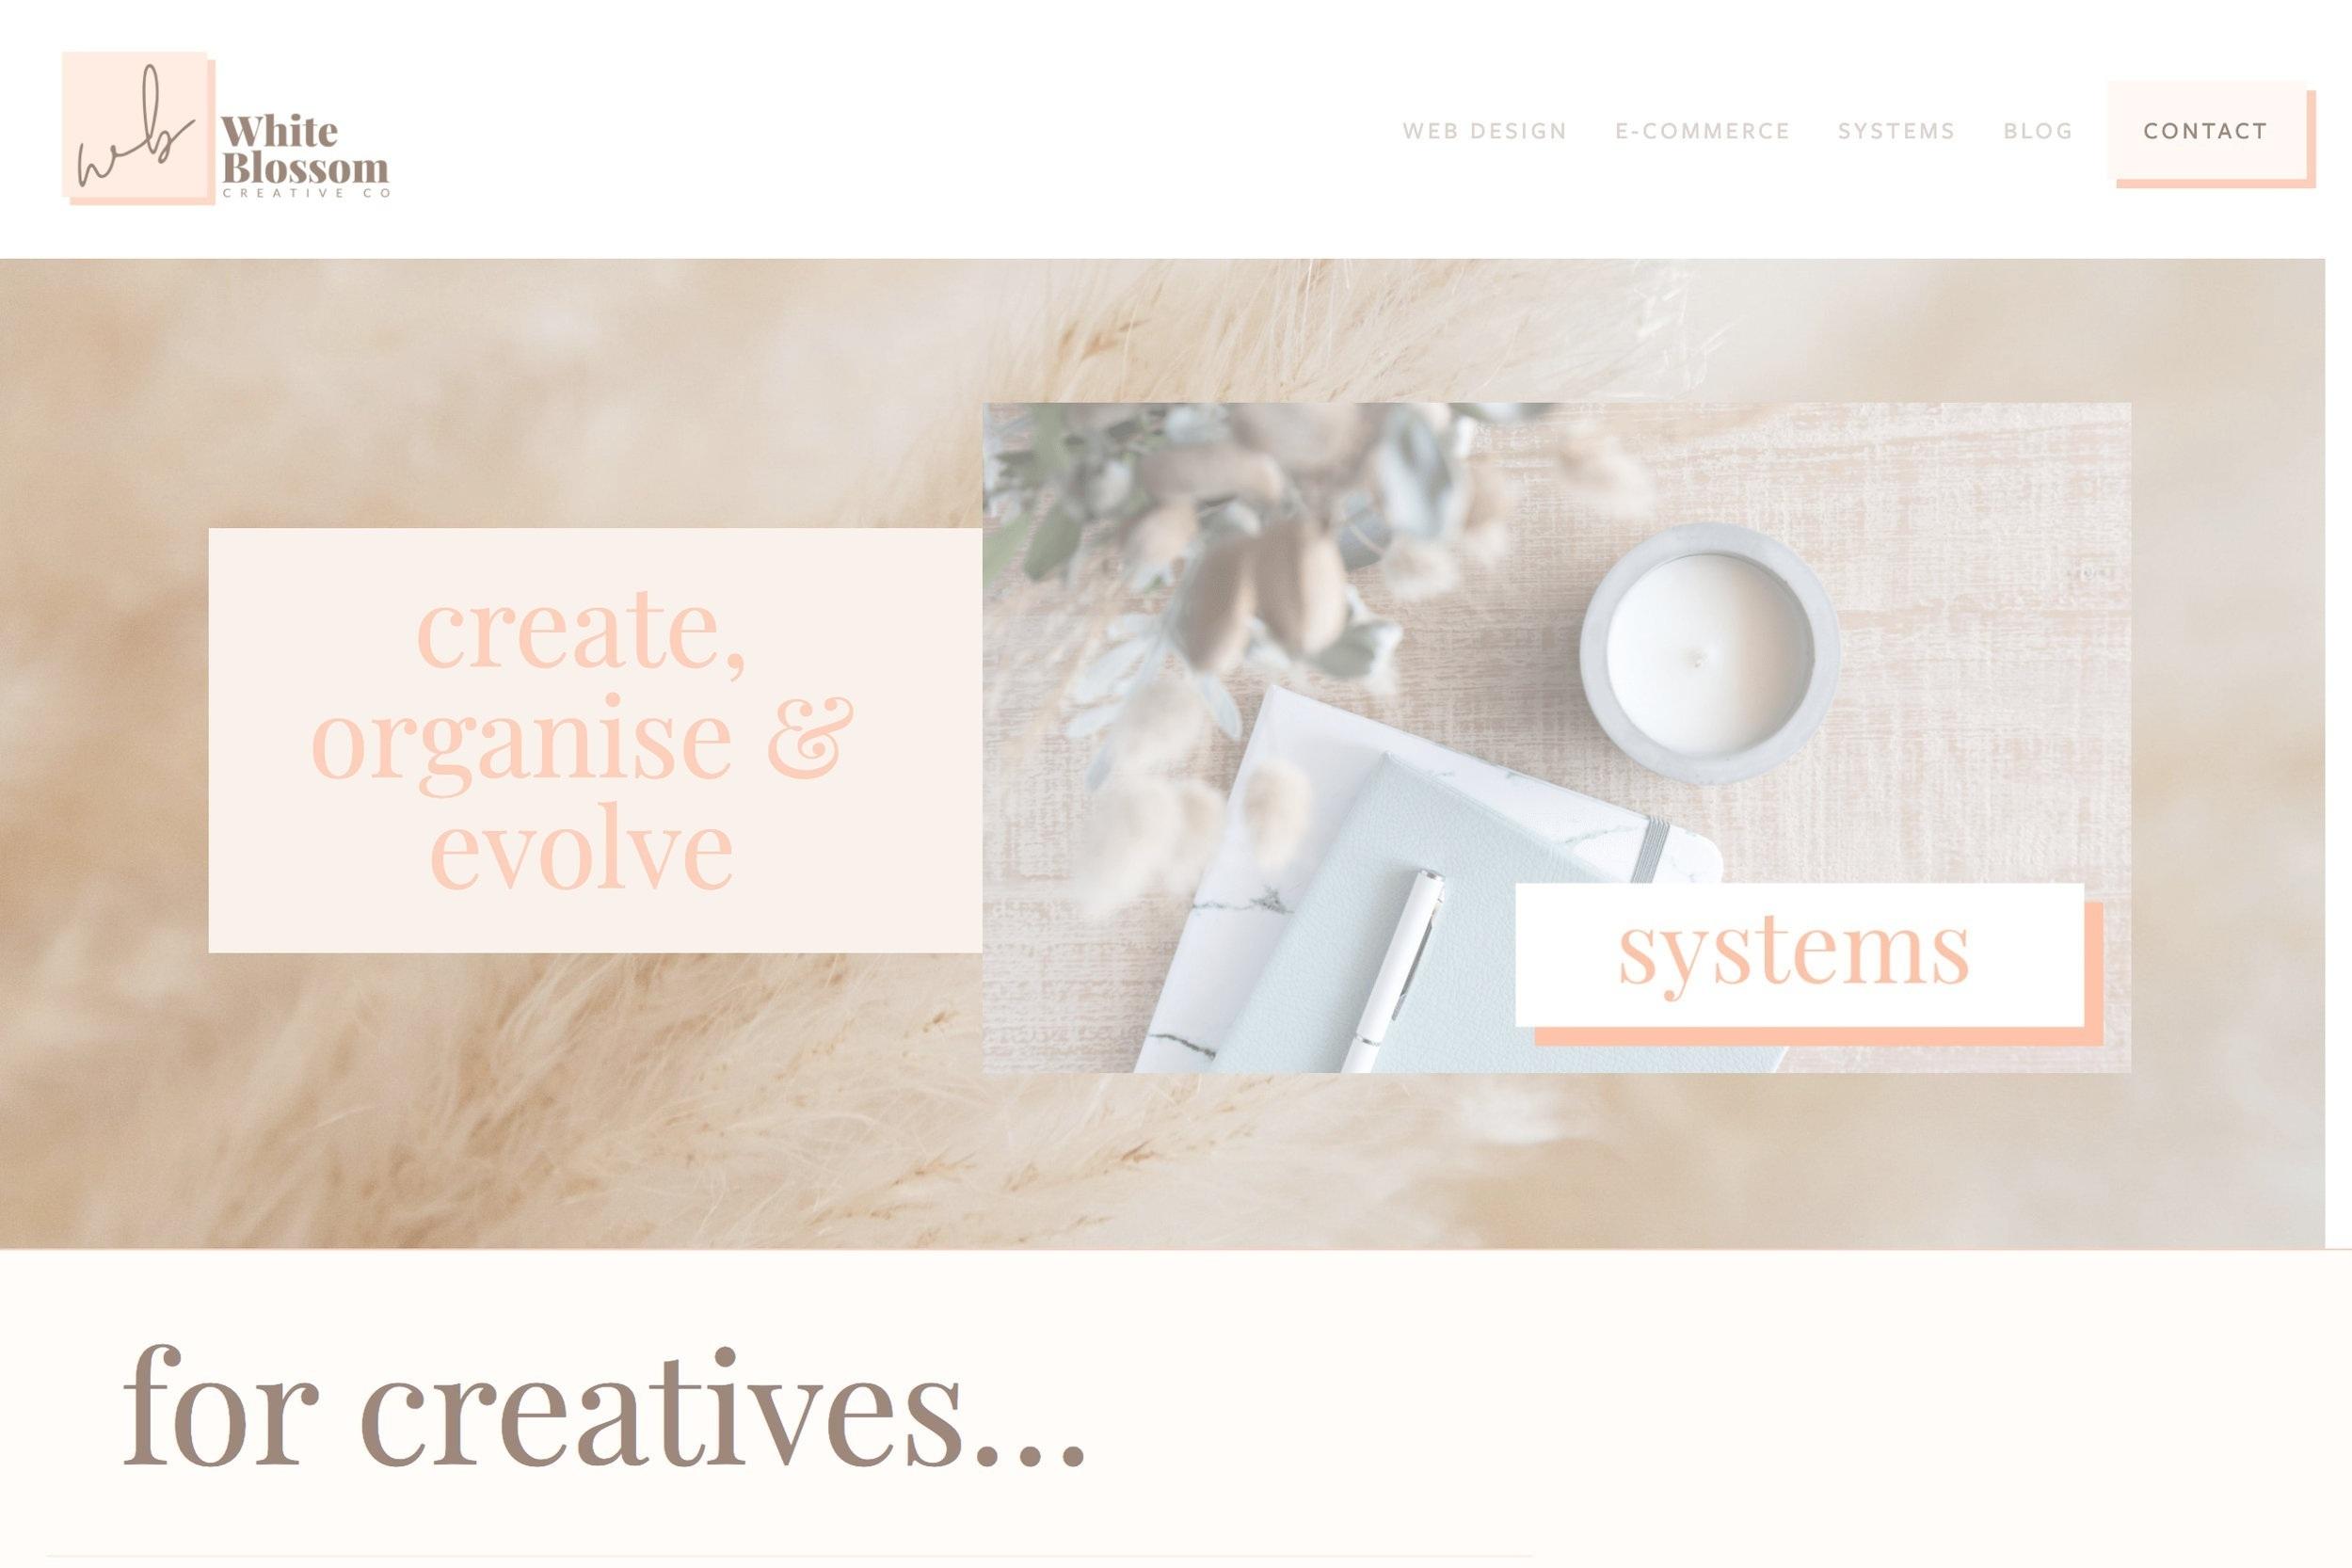 screencapture-whiteblossomcreative-co-uk-home-3-2019-06-12-14_02_31.jpg